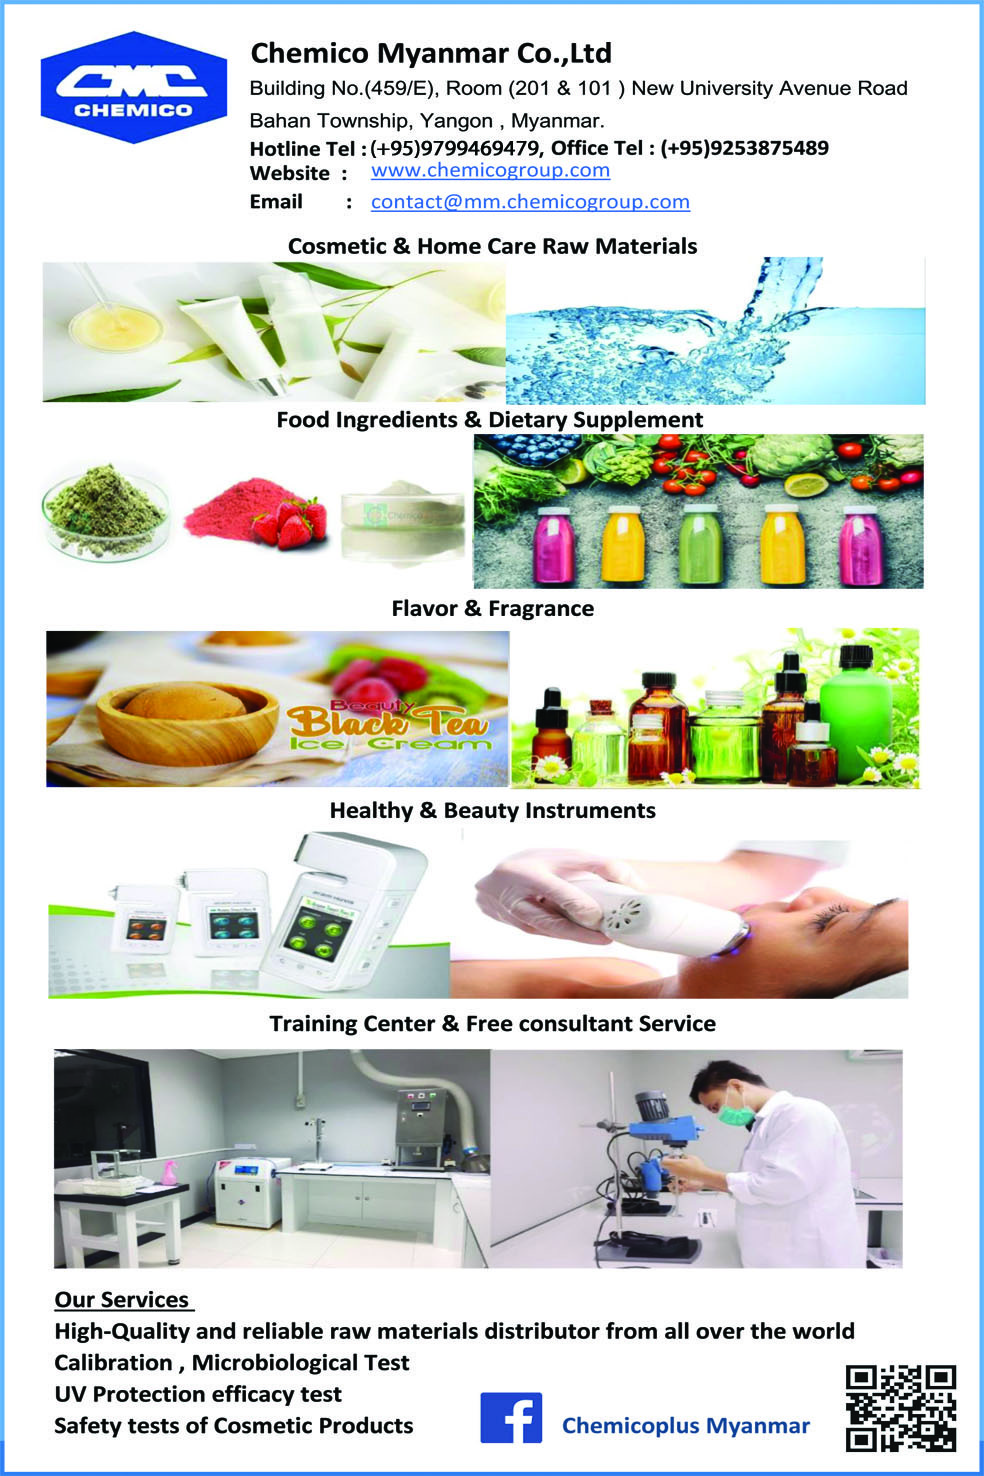 Chemico Myanmar Co , Ltd  - Chemicals